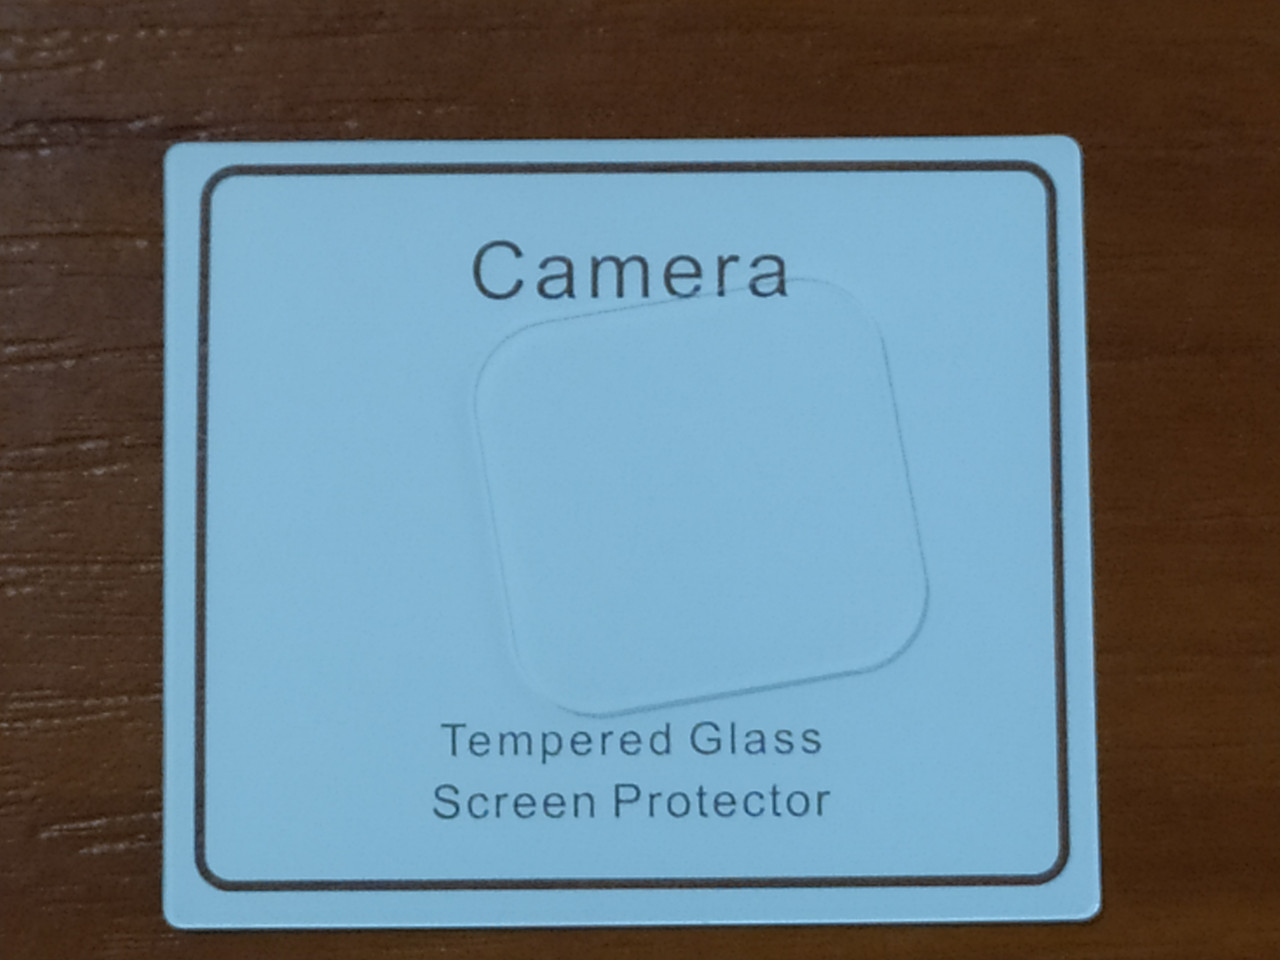 Захисне скло на камеру Tempered Glass Screen Protector Xiaomi Redmi 9C